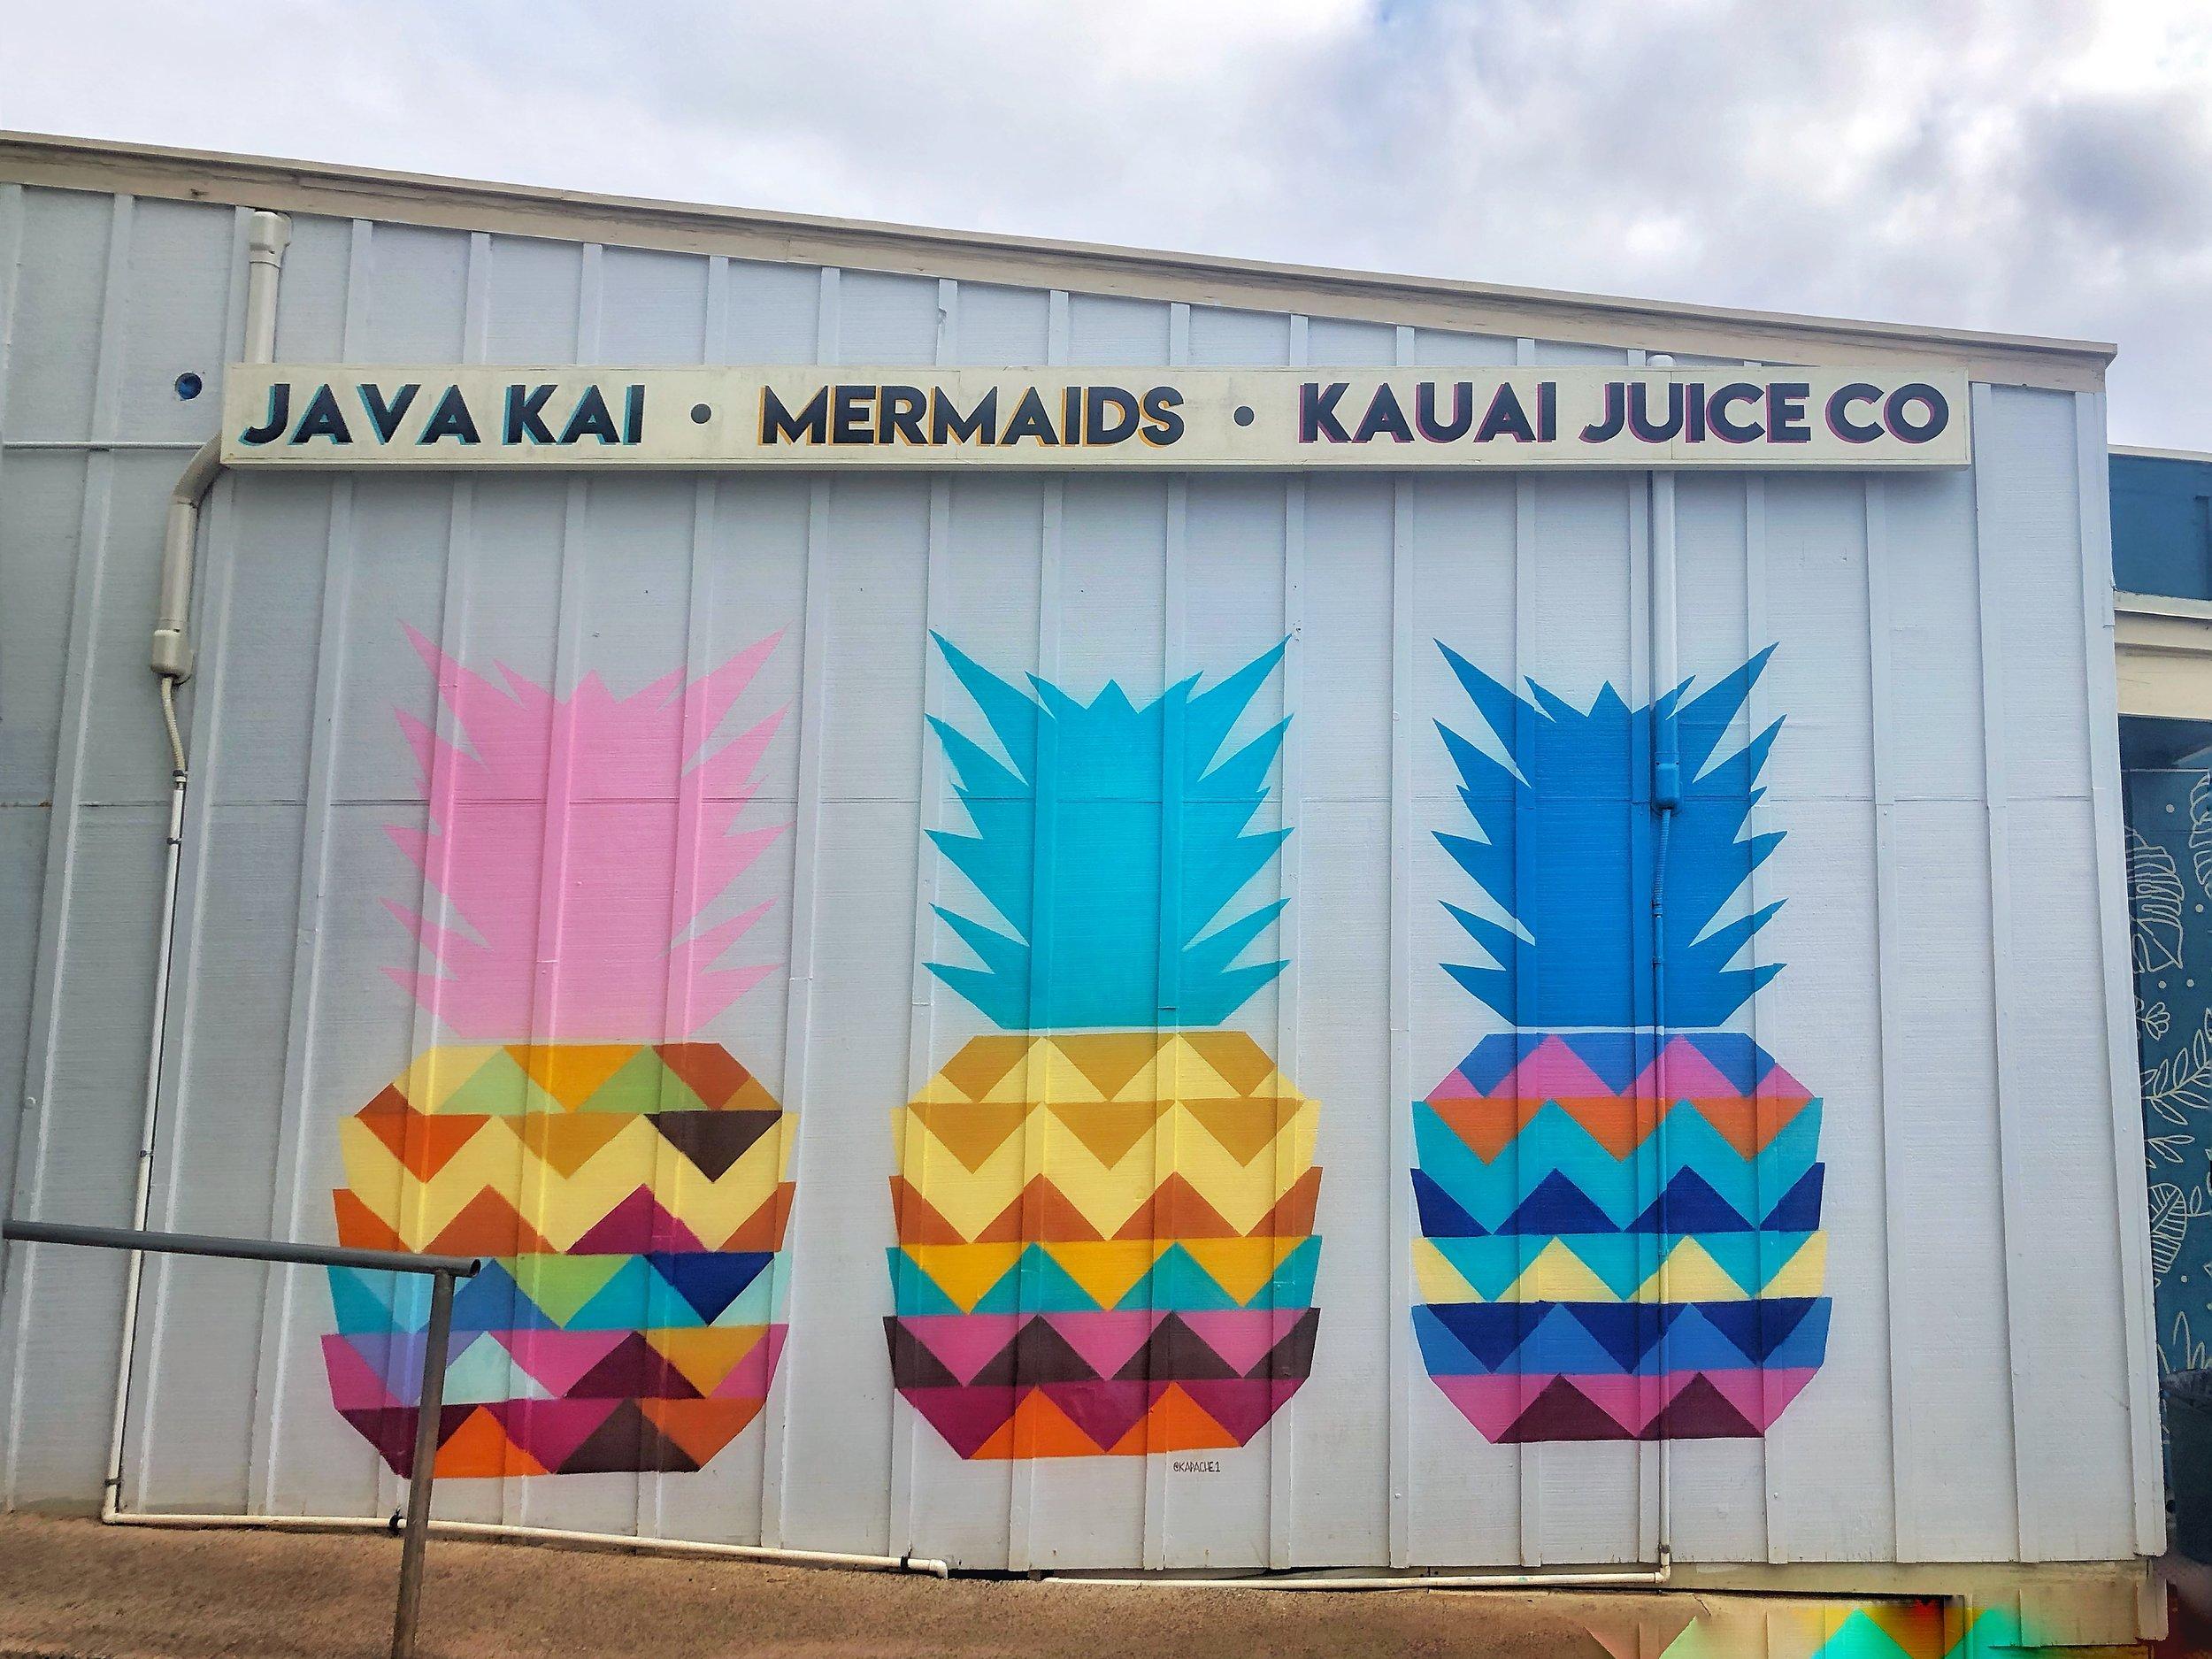 kauai juice co.jpg